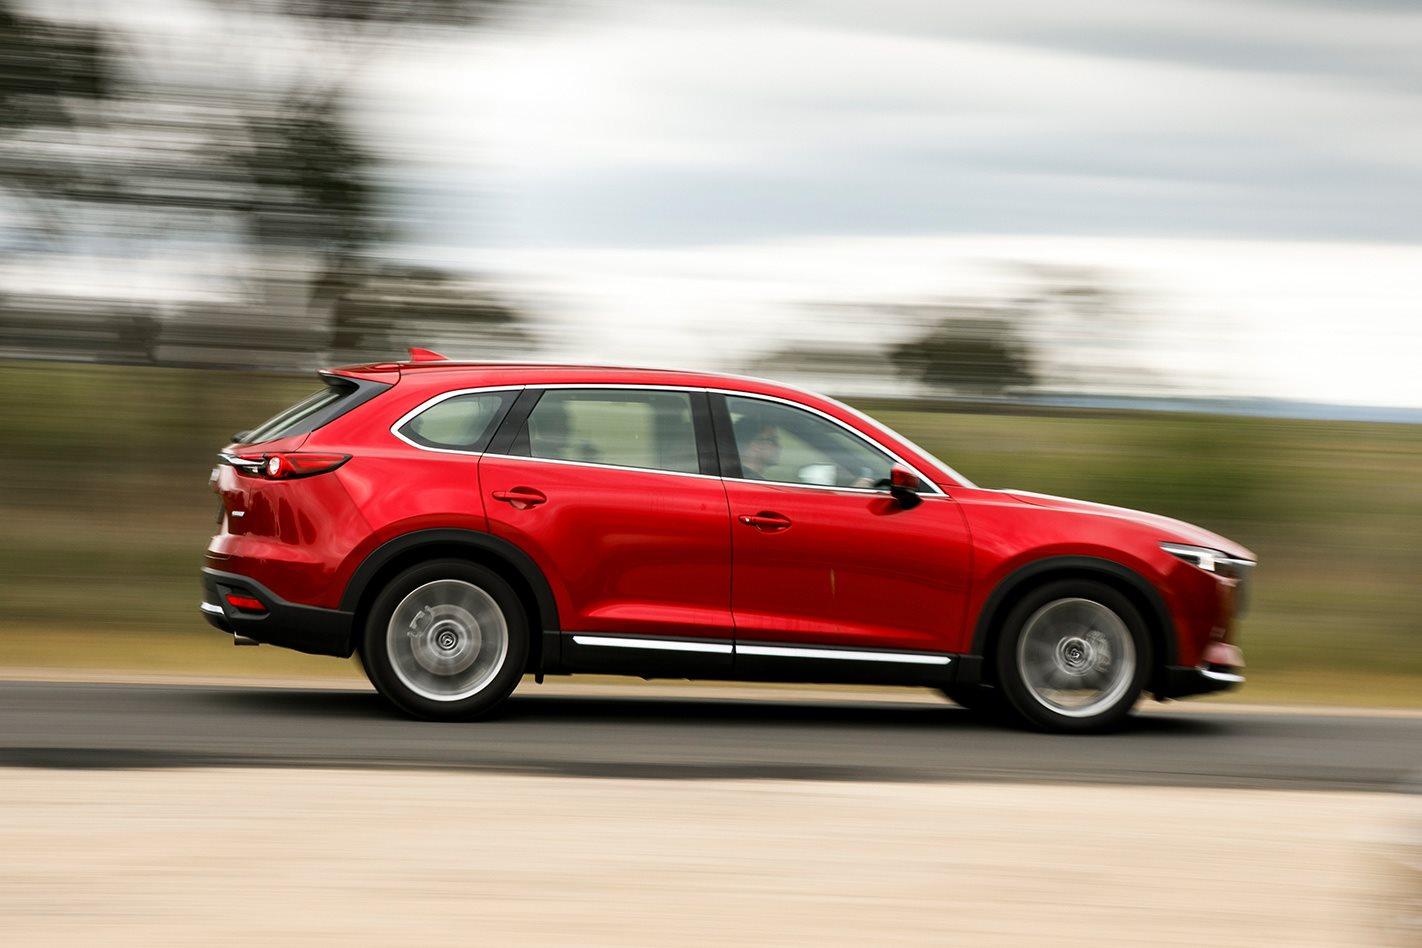 Mazda CX-9 v Toyota Kluger comparison review